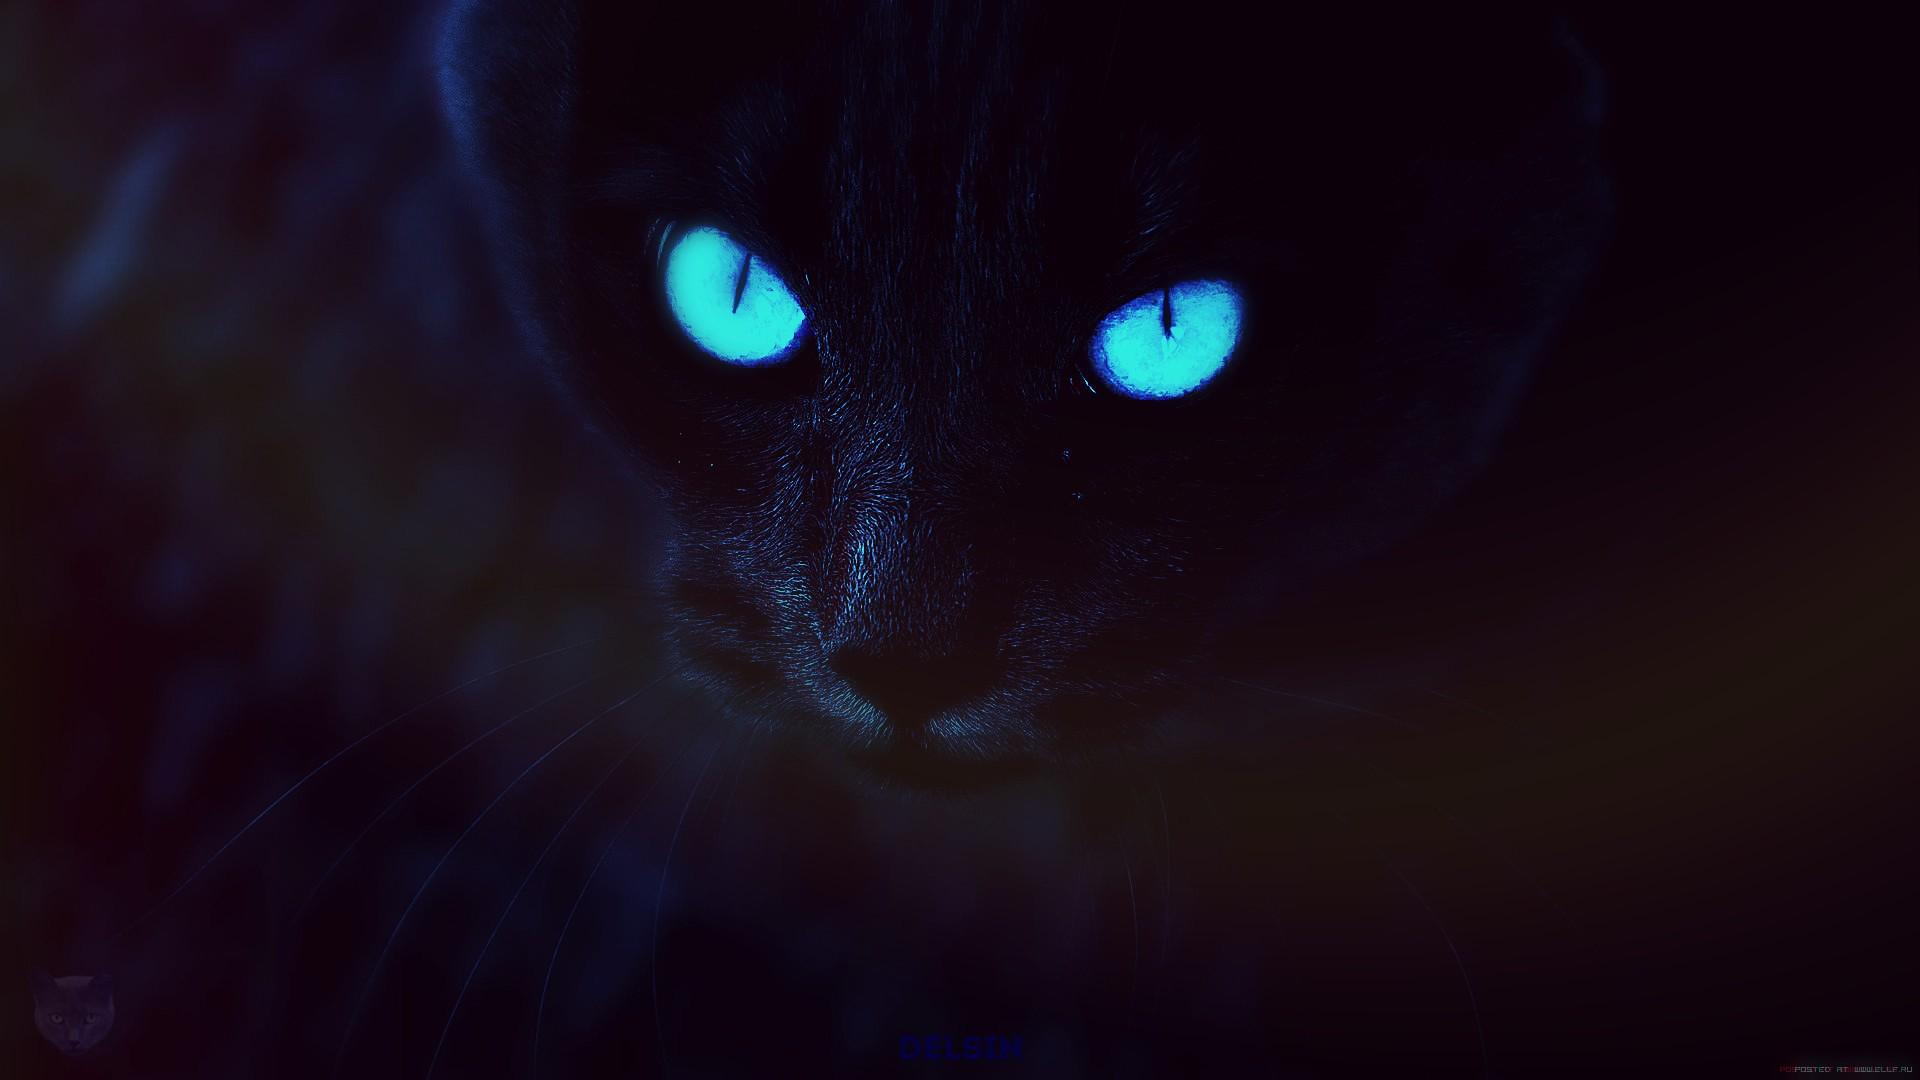 Black Cat laptop background